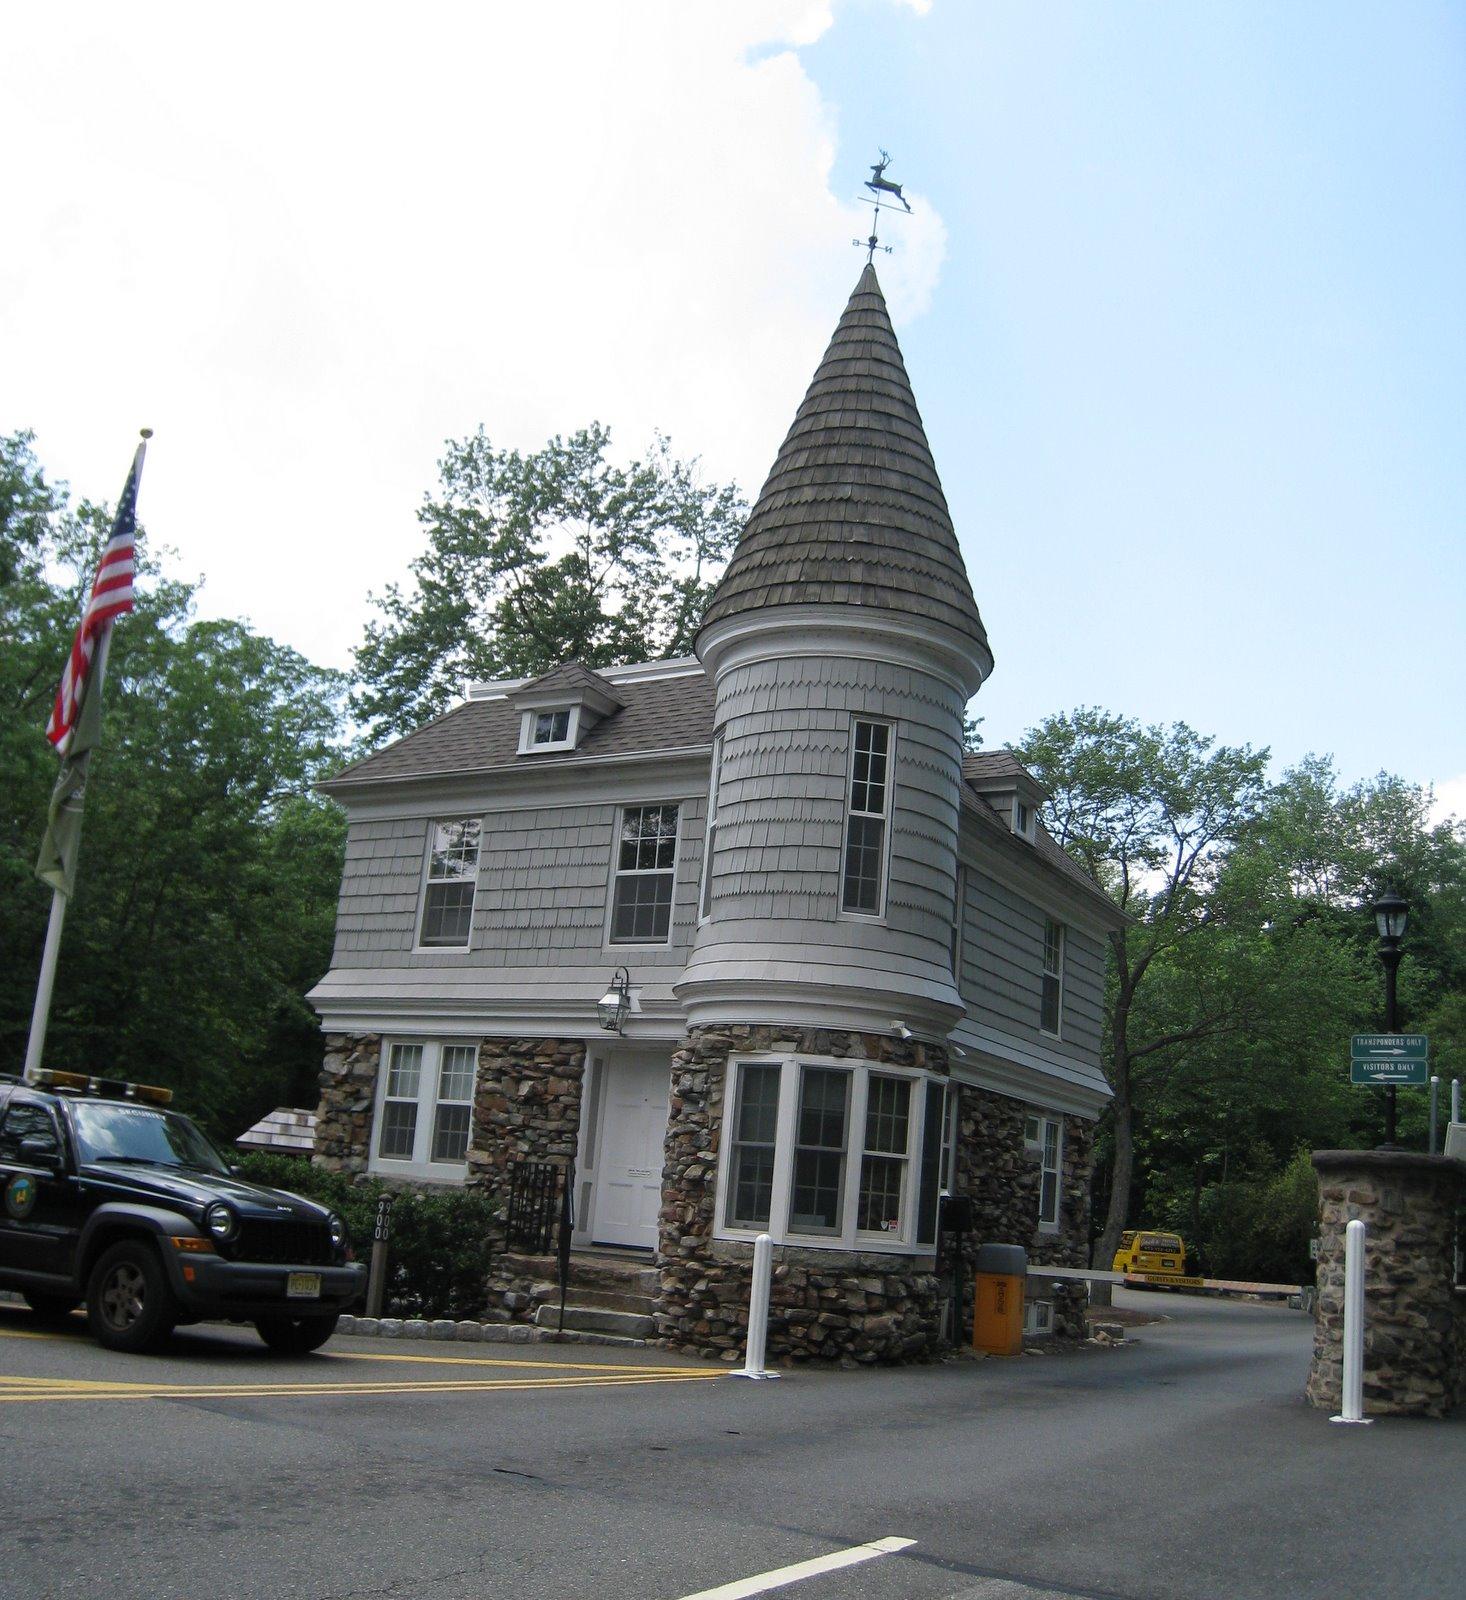 East Gate House